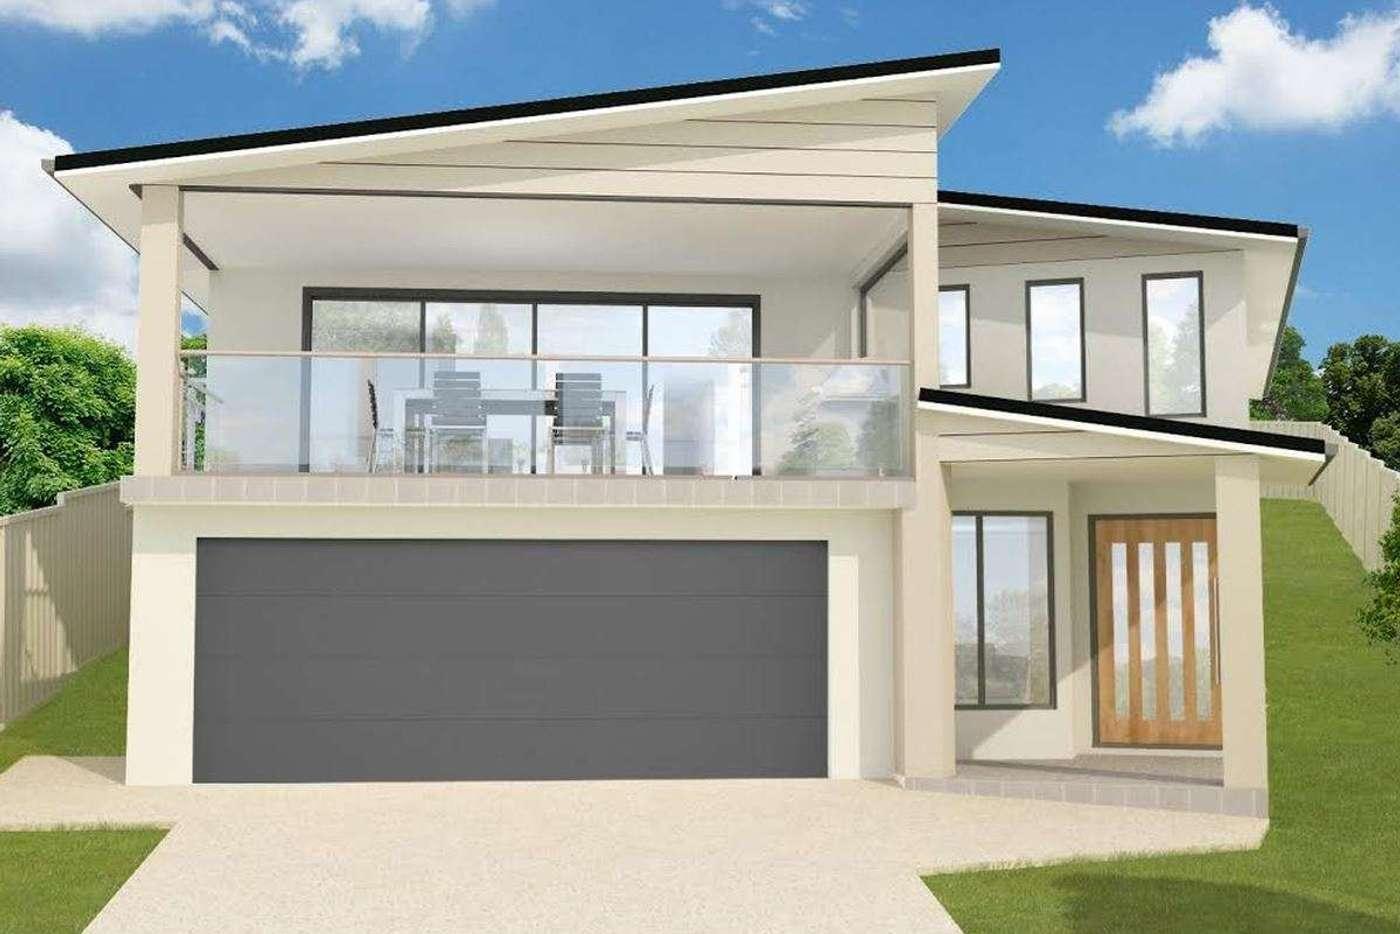 Main view of Homely house listing, 26 Trout St, Kanimbla QLD 4870, Australia, Kanimbla QLD 4870